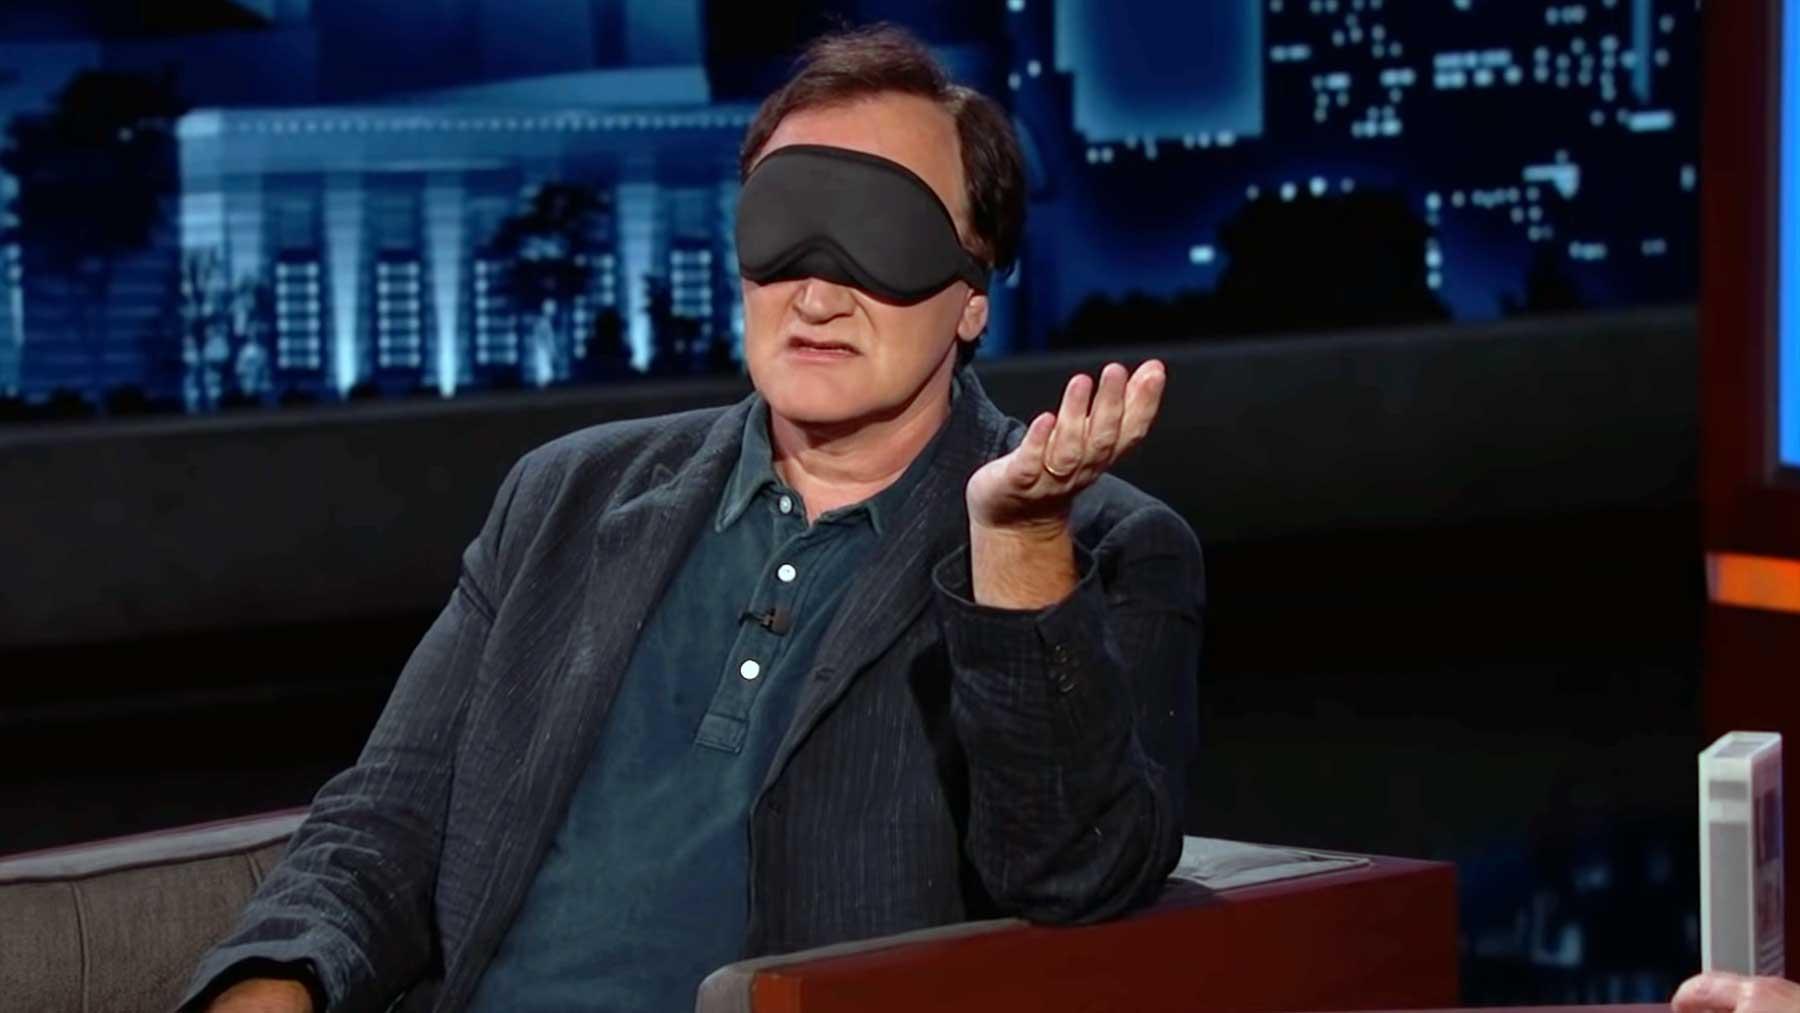 Quentin Tarantino rät Filme anhand ihrer VHS-Beschreibungen